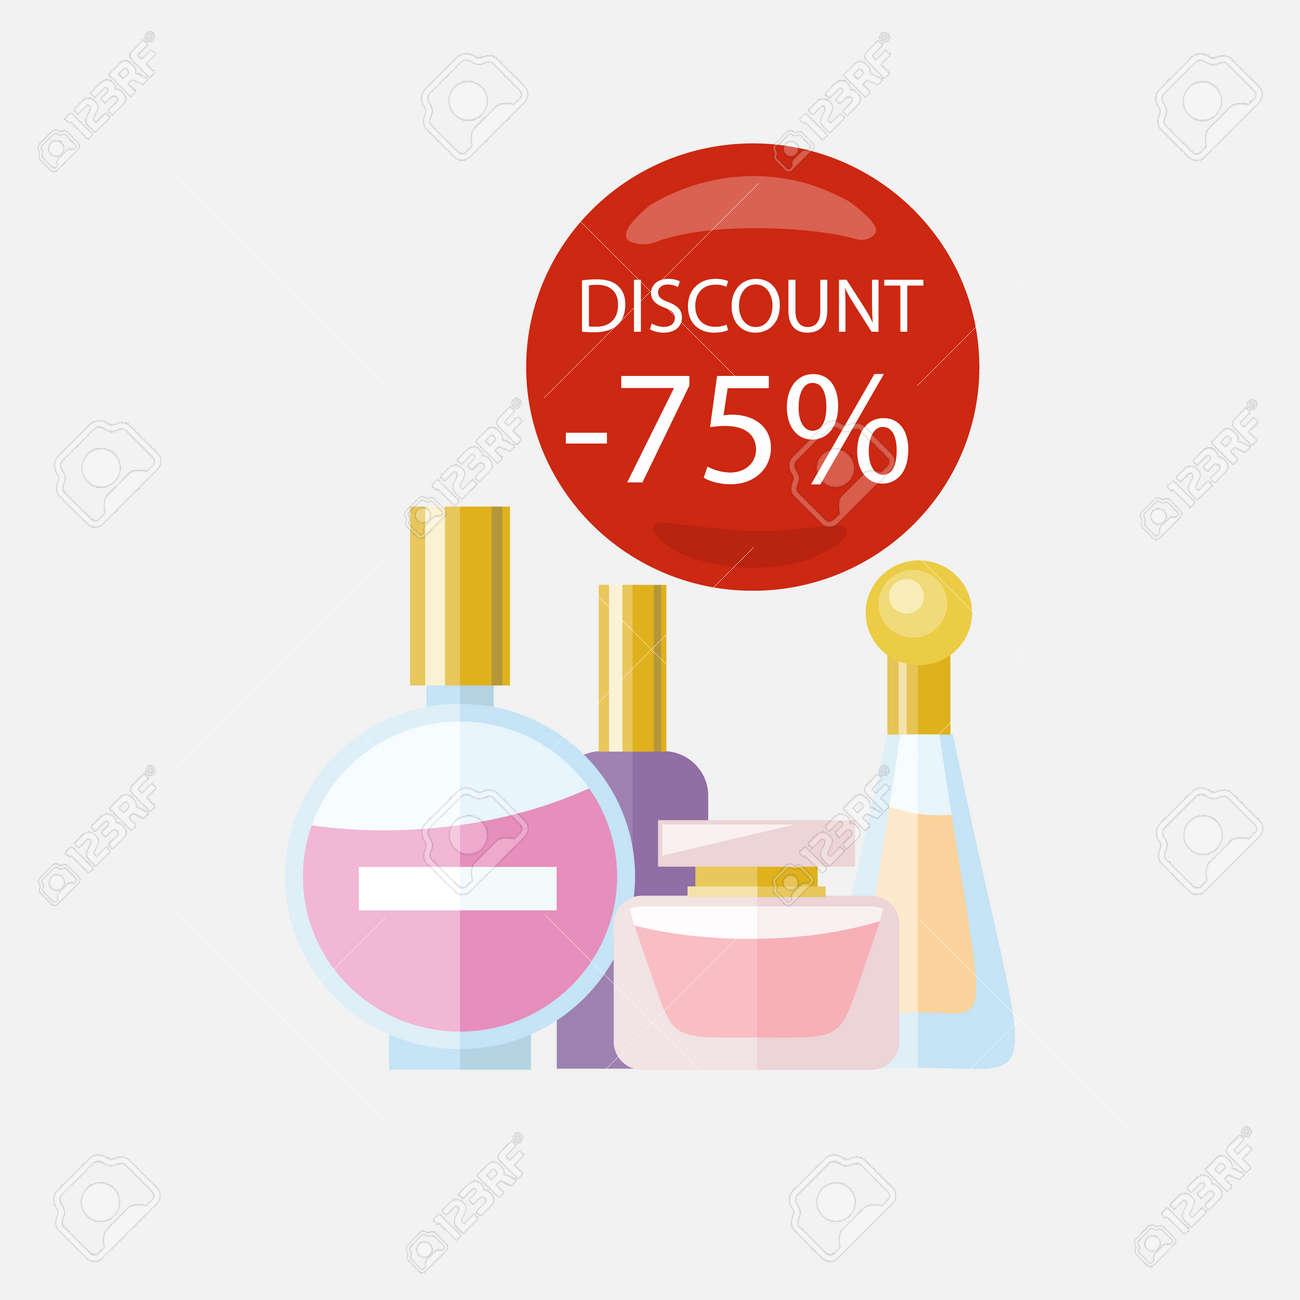 Appliances Discount Sale Of Household Appliances Red Bubble Discount Percentage